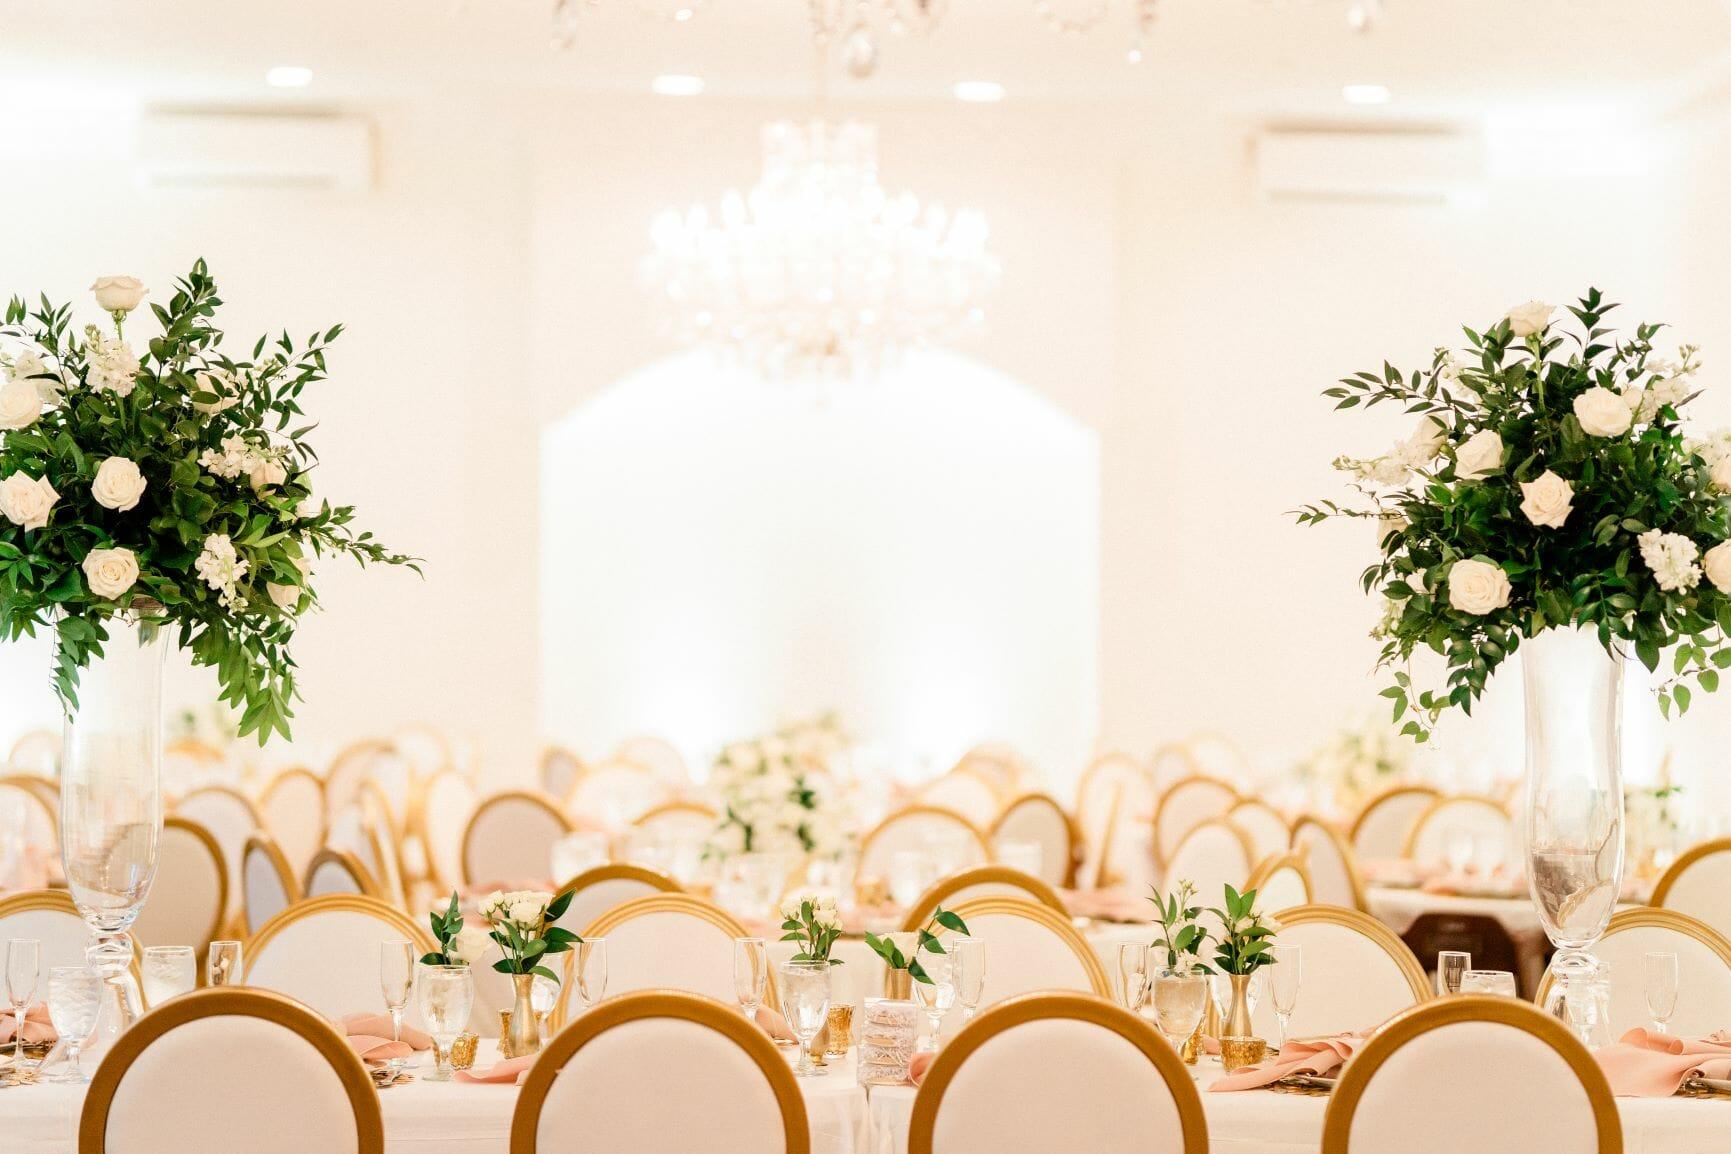 Luxury_event_rentals_orlando1